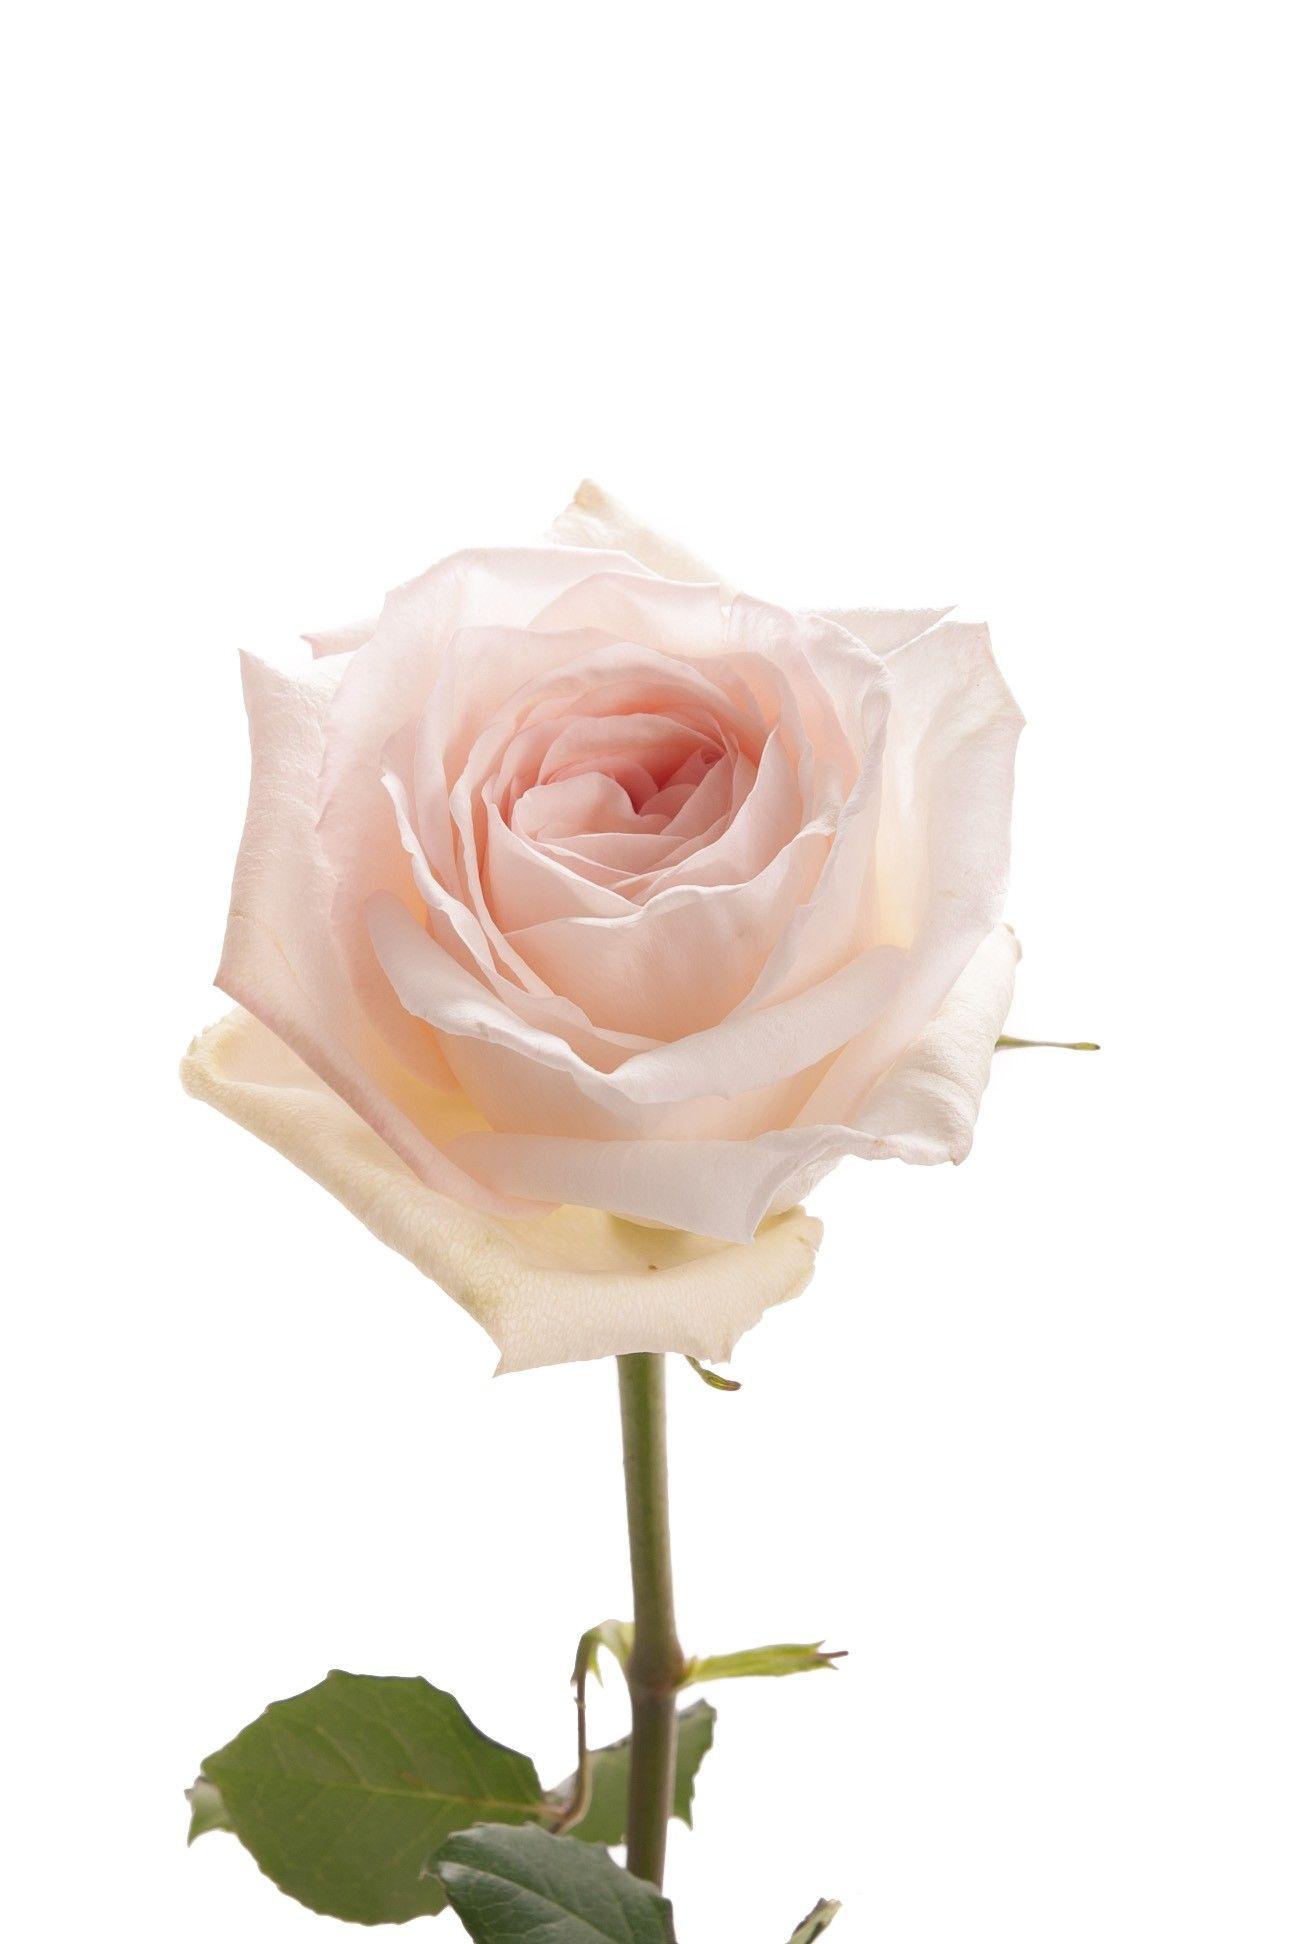 Ordinaire Blush Garden Rose   White Ou0027hara   Garden Roses   Roses   Flower Muse